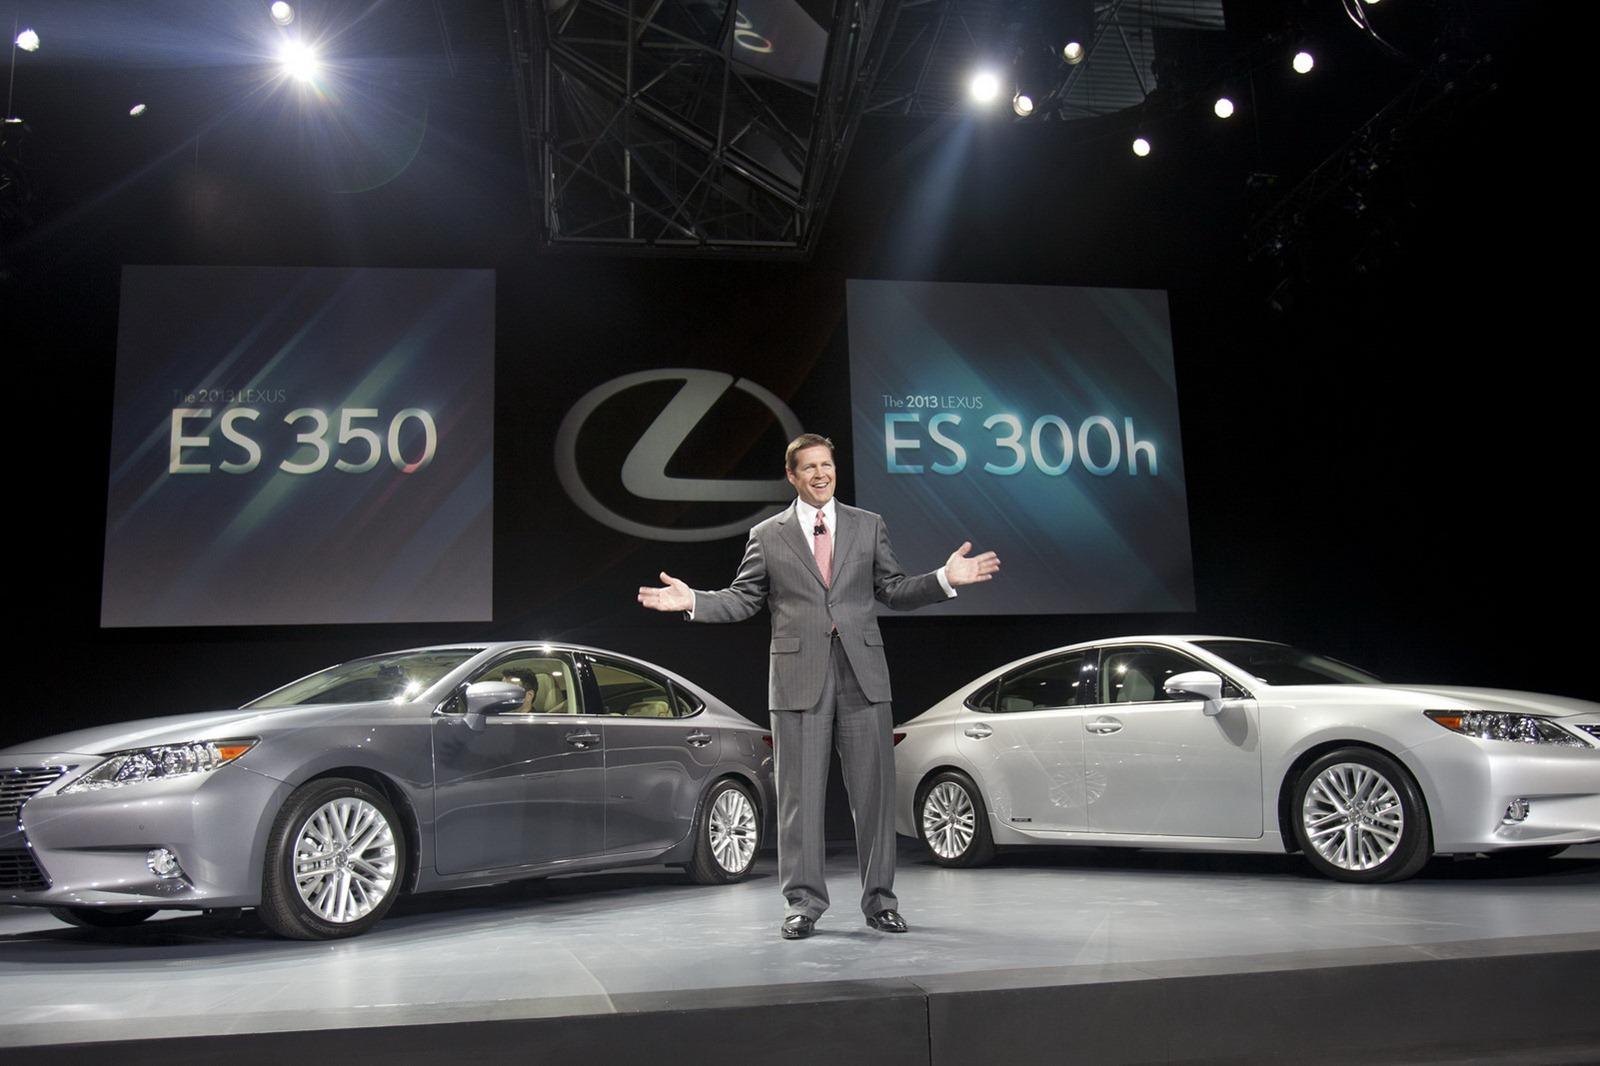 http://lh4.ggpht.com/-Nt4tmHCT1JI/T3y68_bc0FI/AAAAAAAHQG0/OVYwLuGH5gI/s1600/2013-Lexus-ES-4%25255B2%25255D.jpg